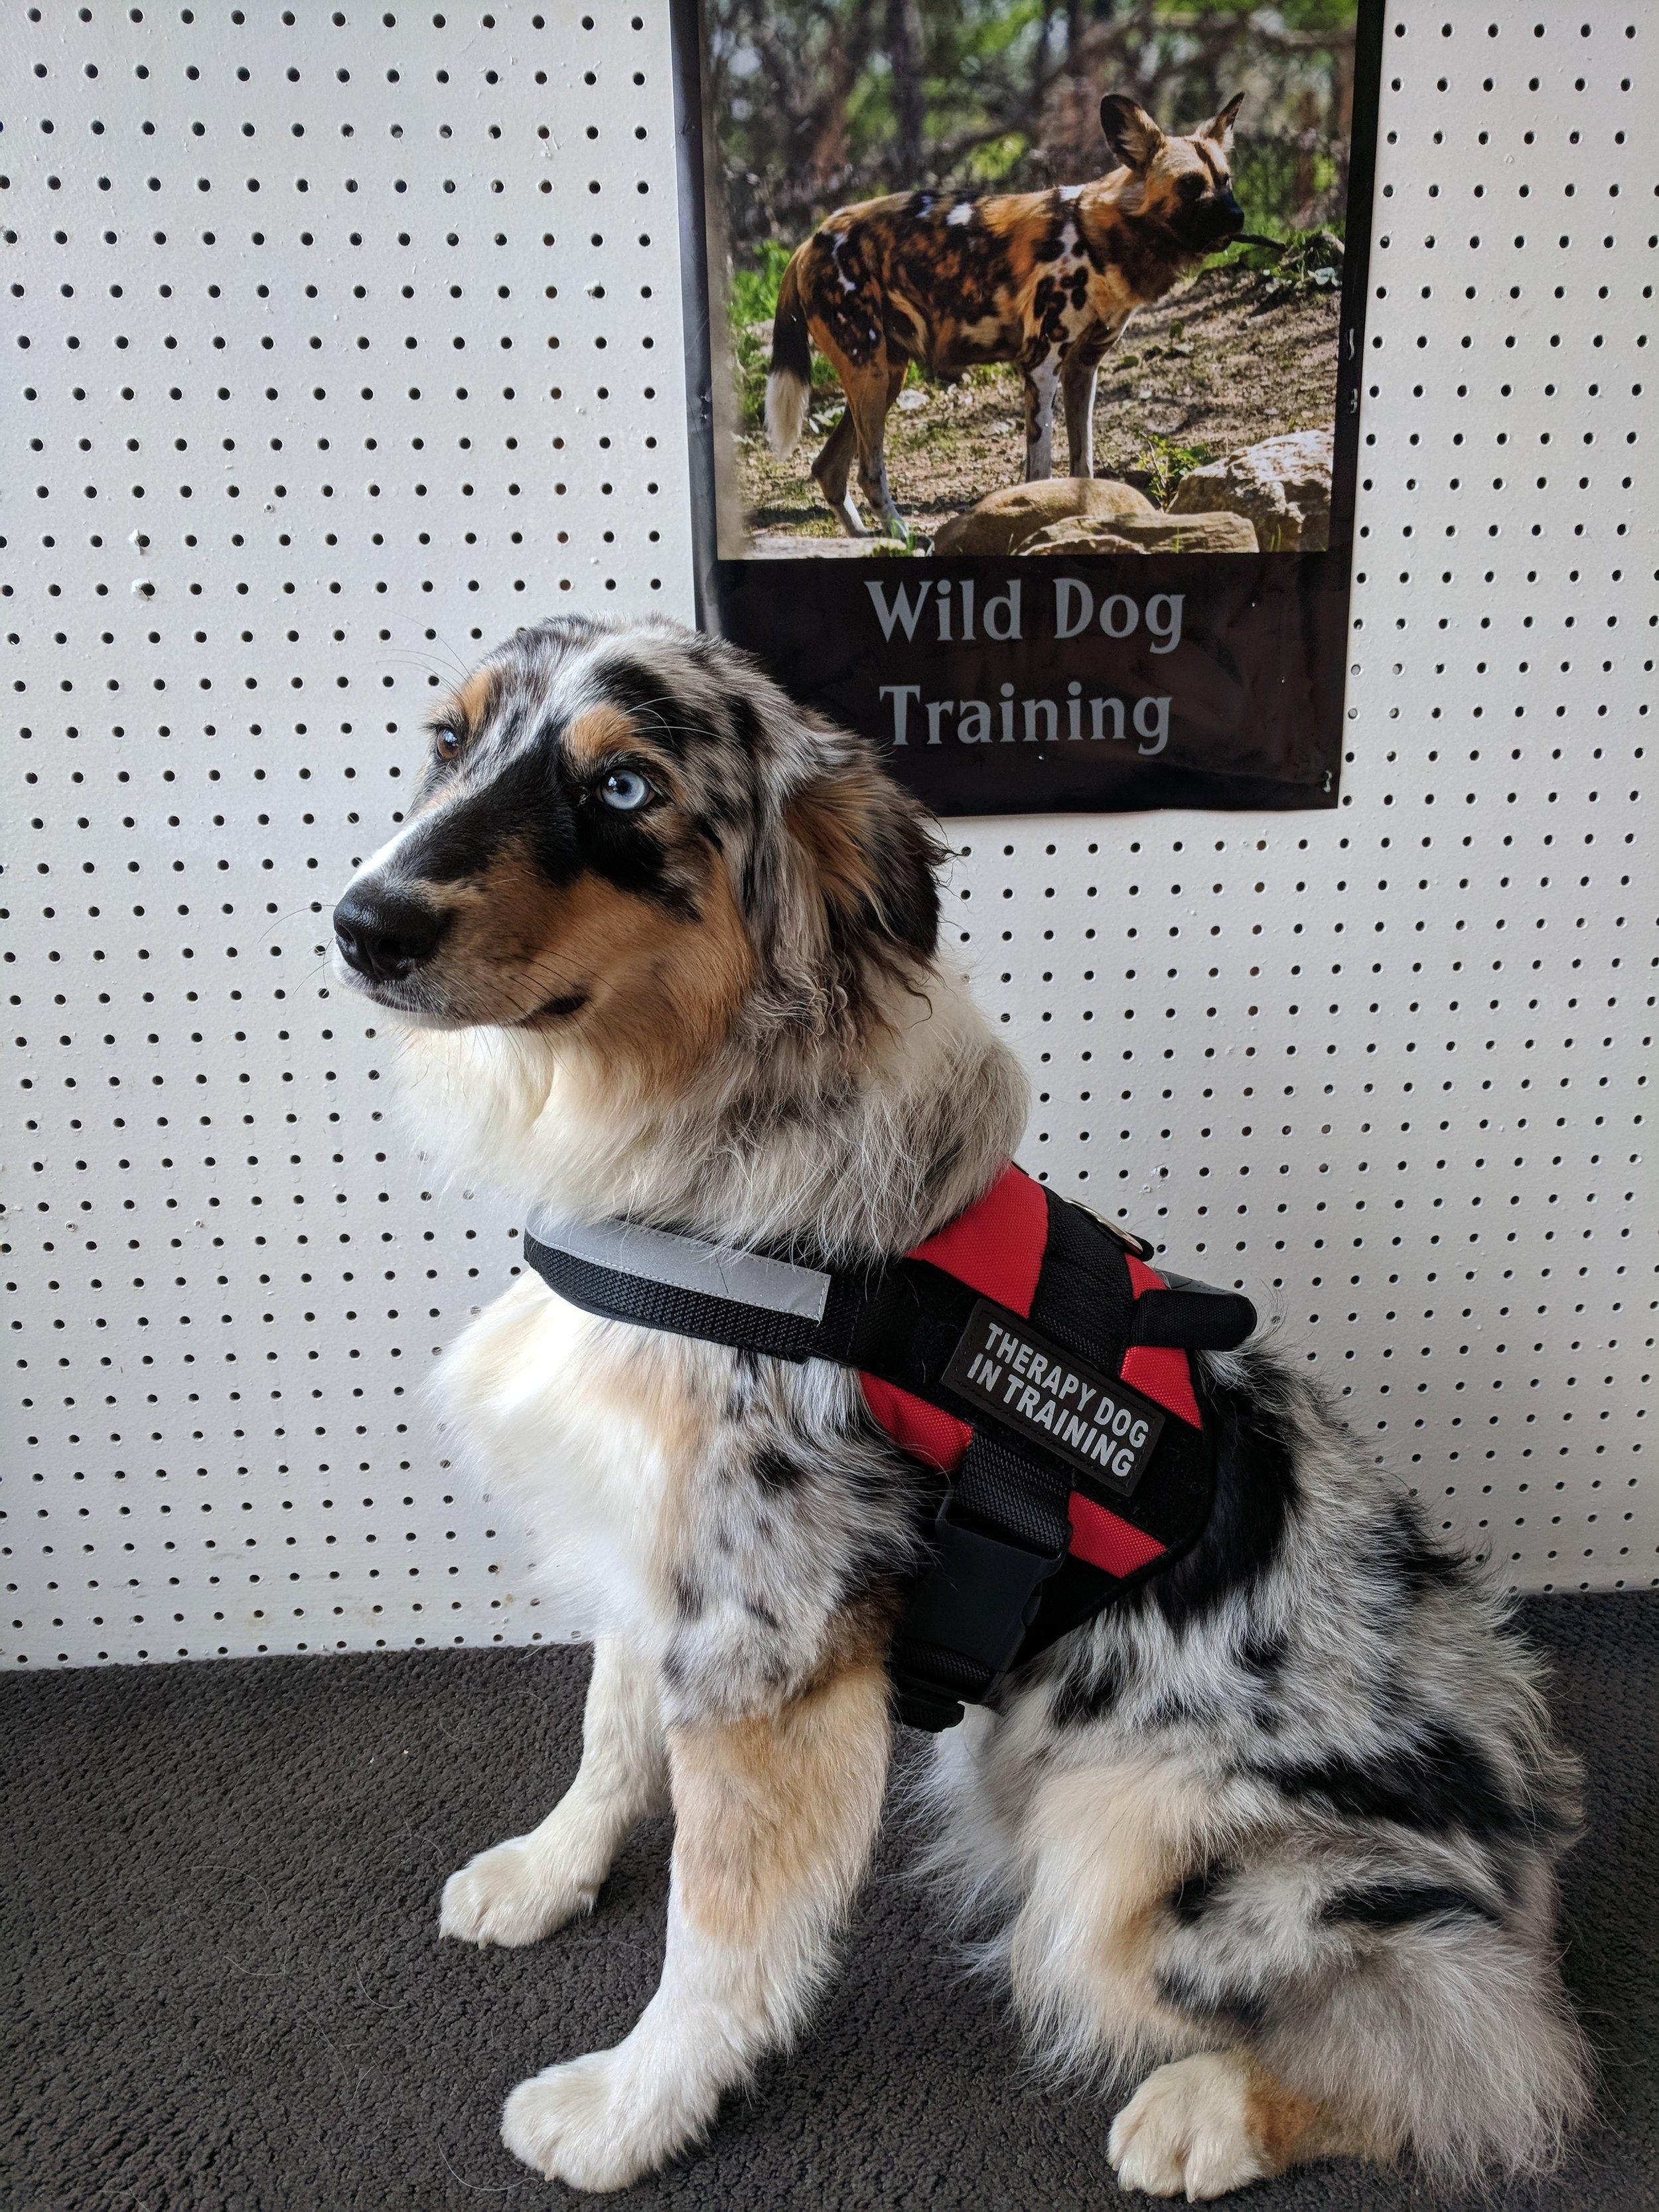 wilddogtherapy2.jpg